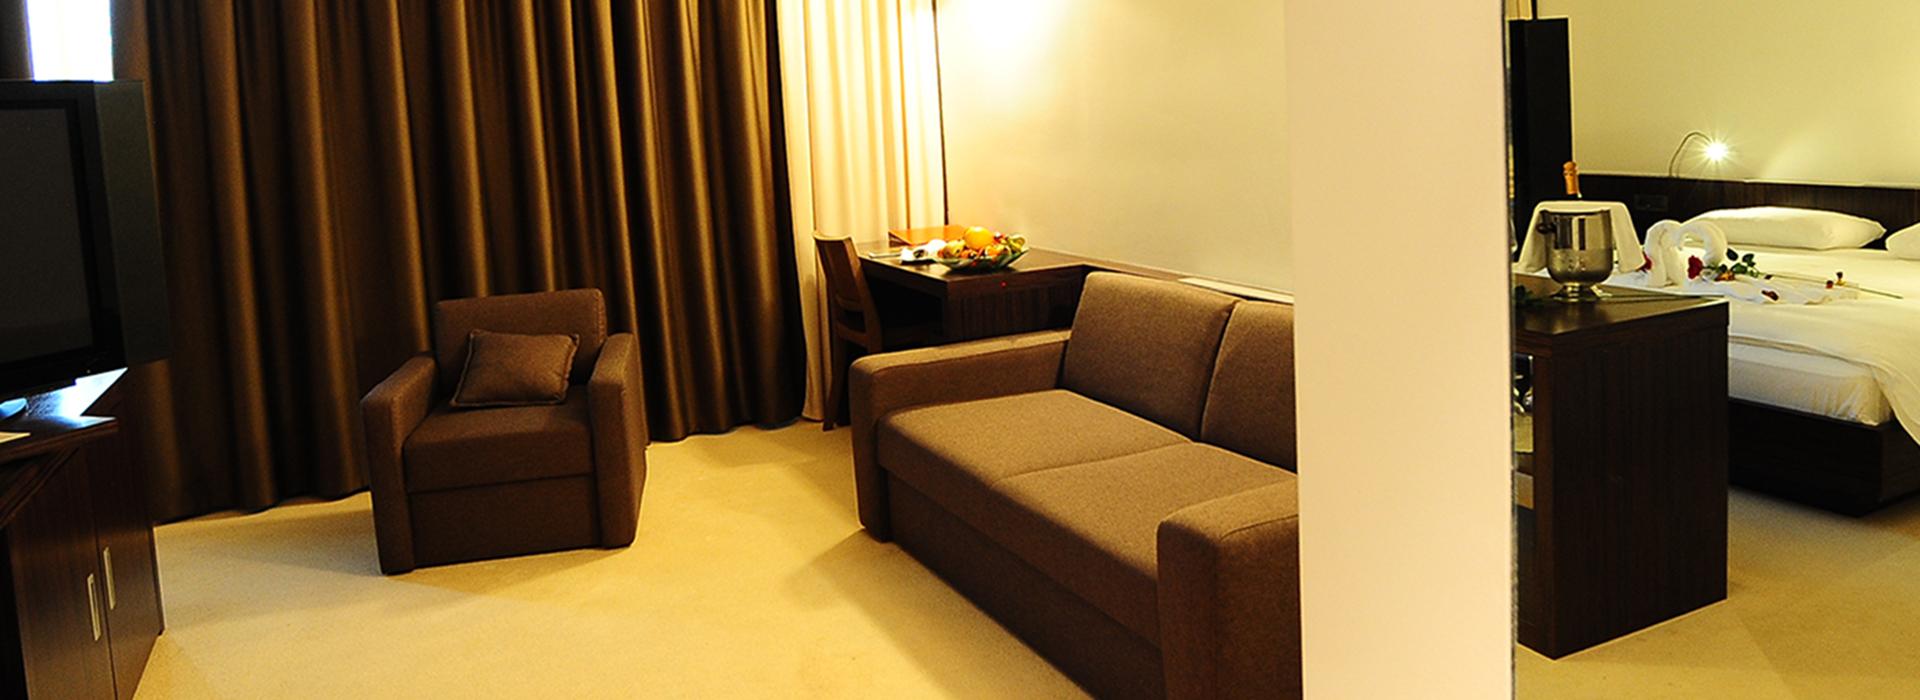 slider_hotel_2